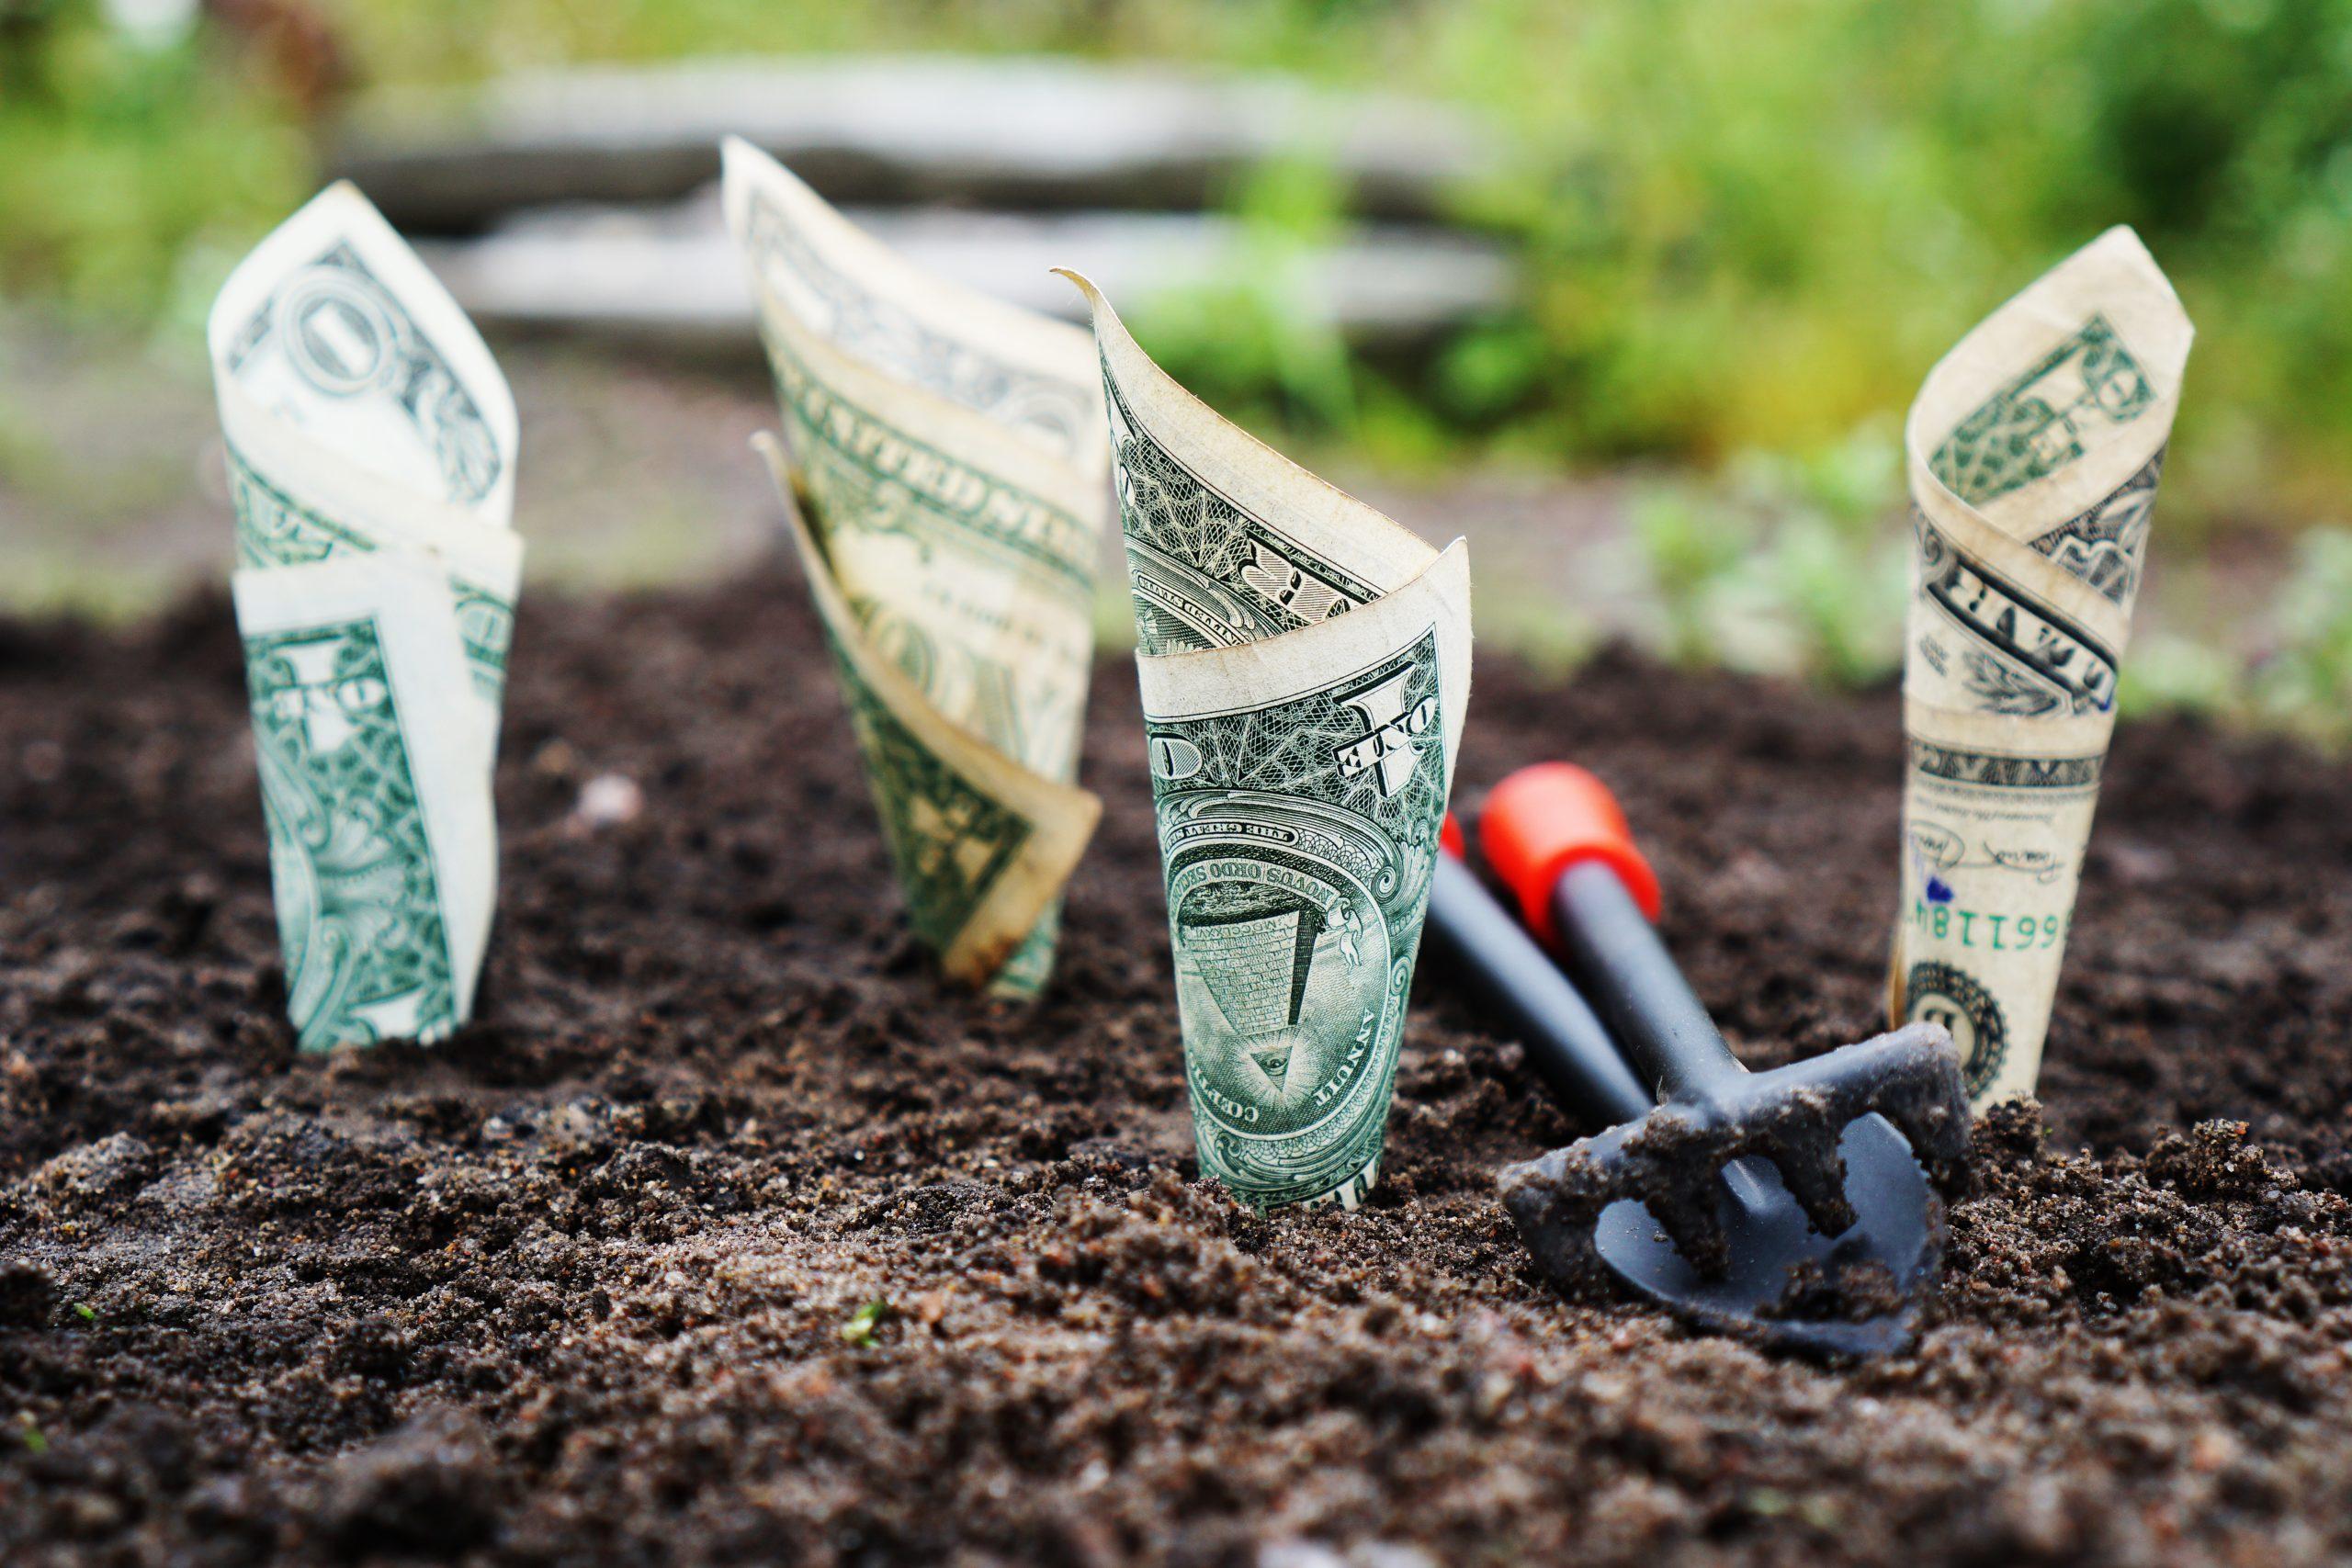 Money growing in the dirt